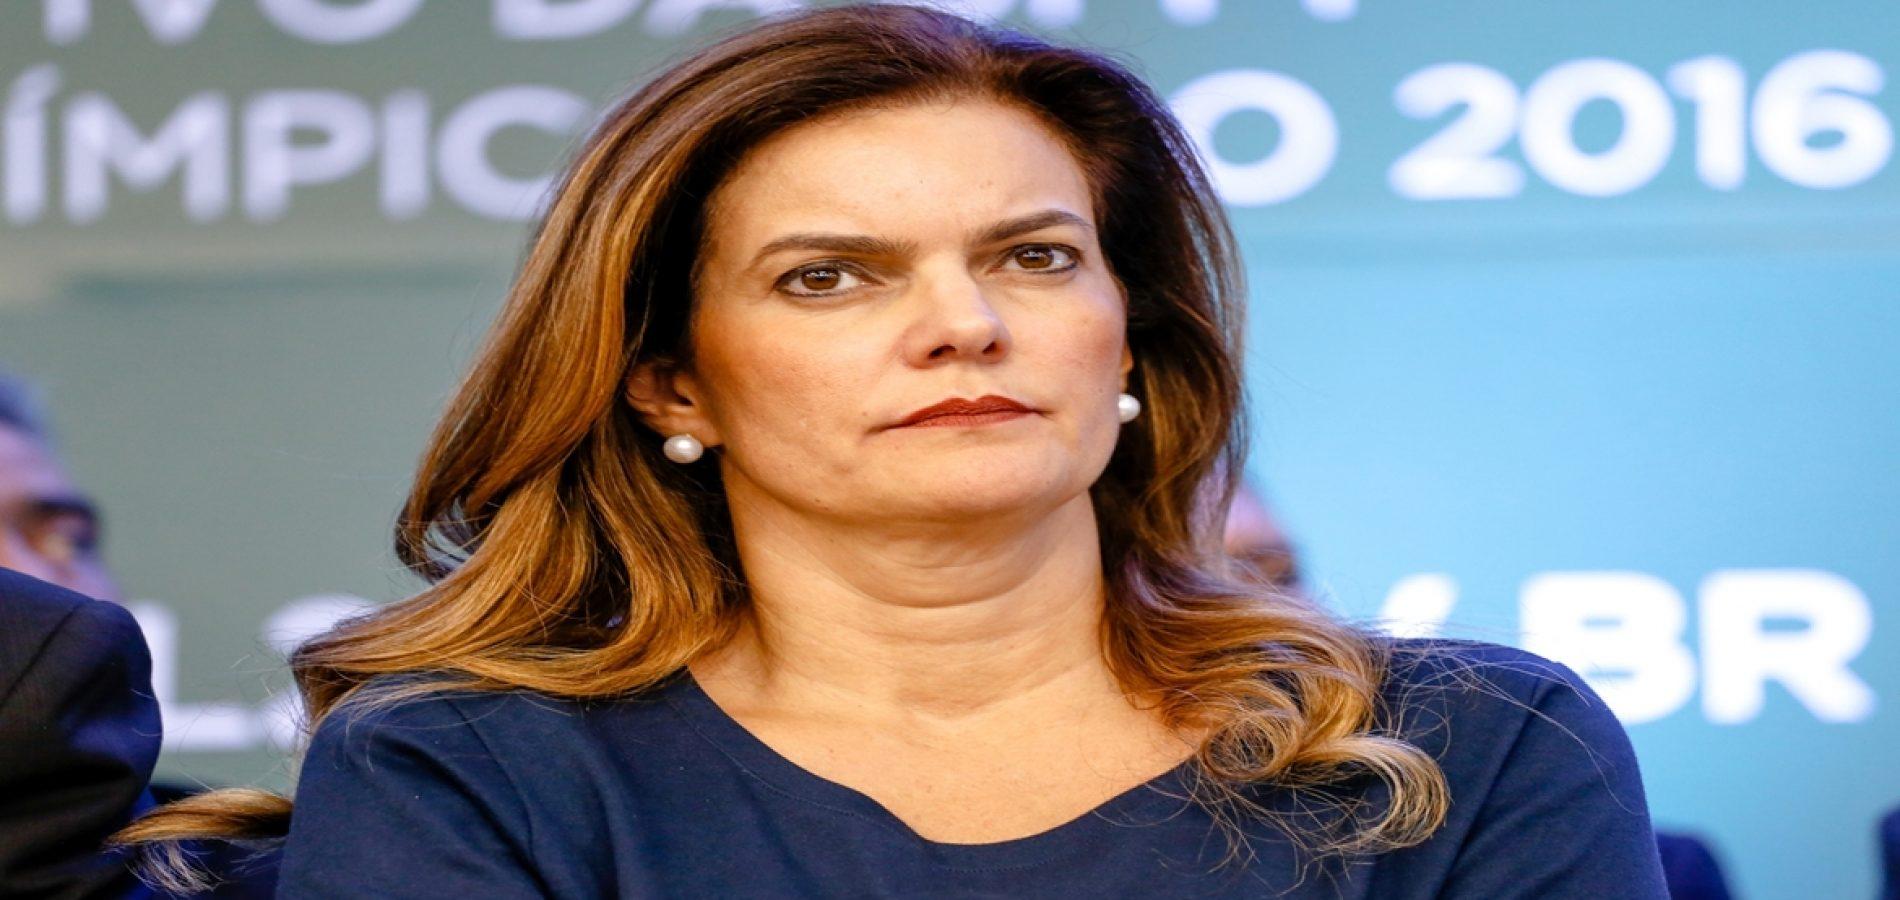 Apoio a Bolsonaro vai depender do tratamento ao Piauí, diz Iracema Portela